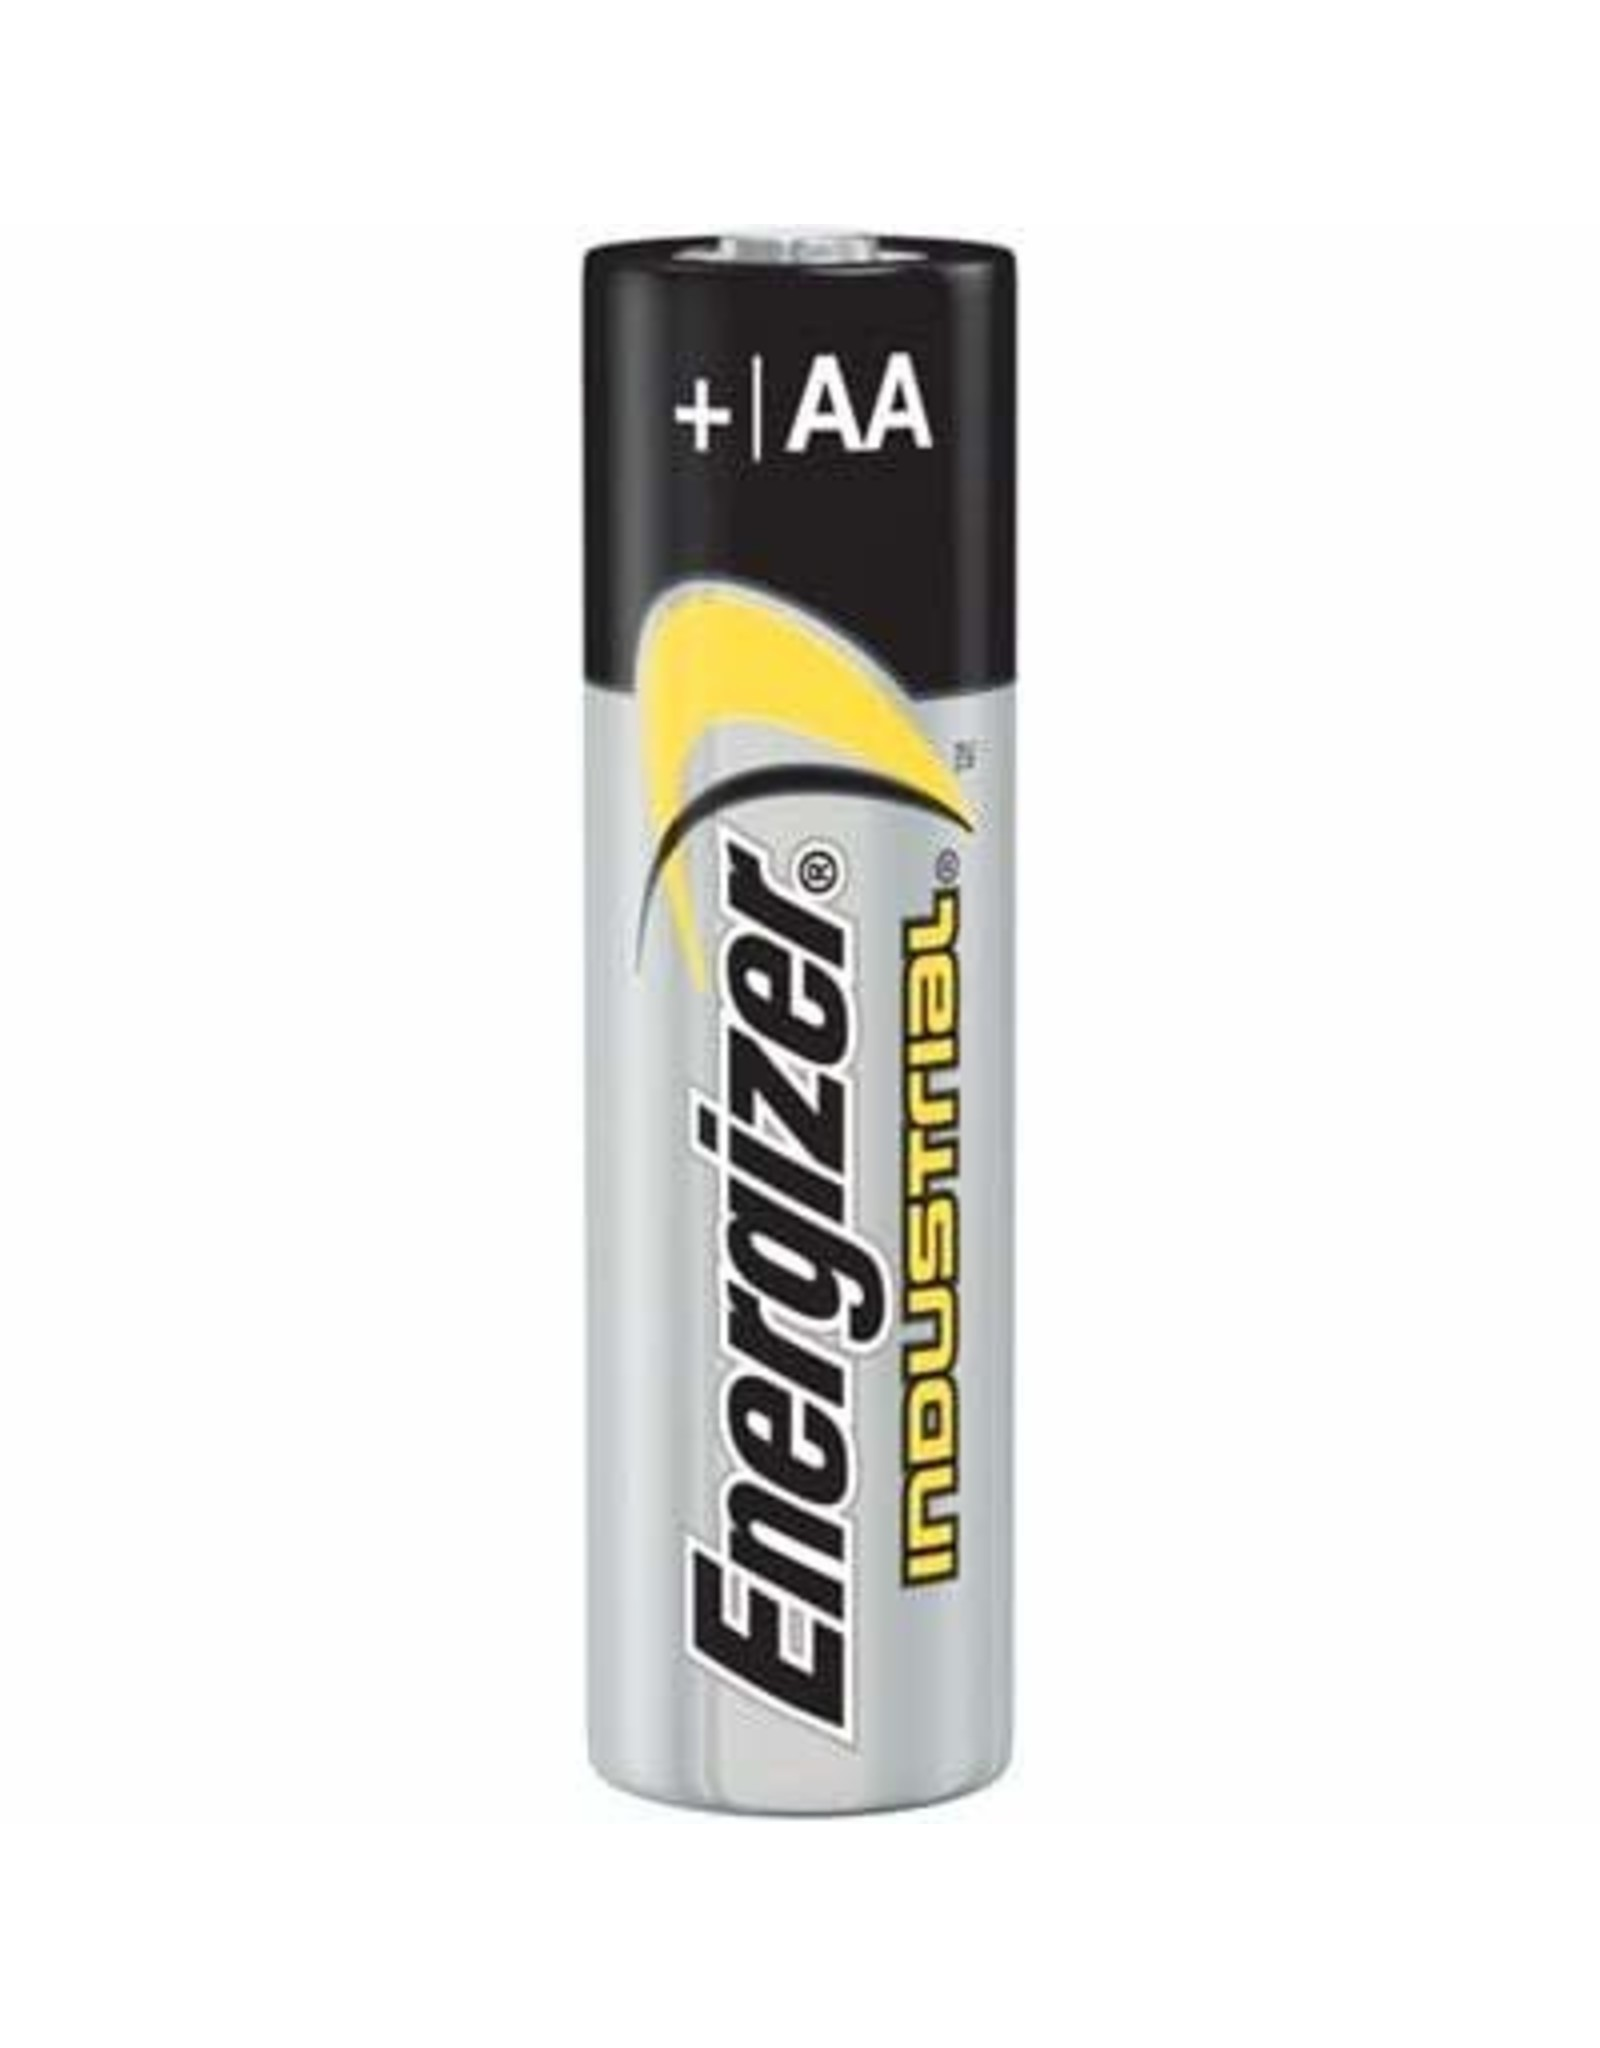 Energizer Energizer AA 24pk Batteries